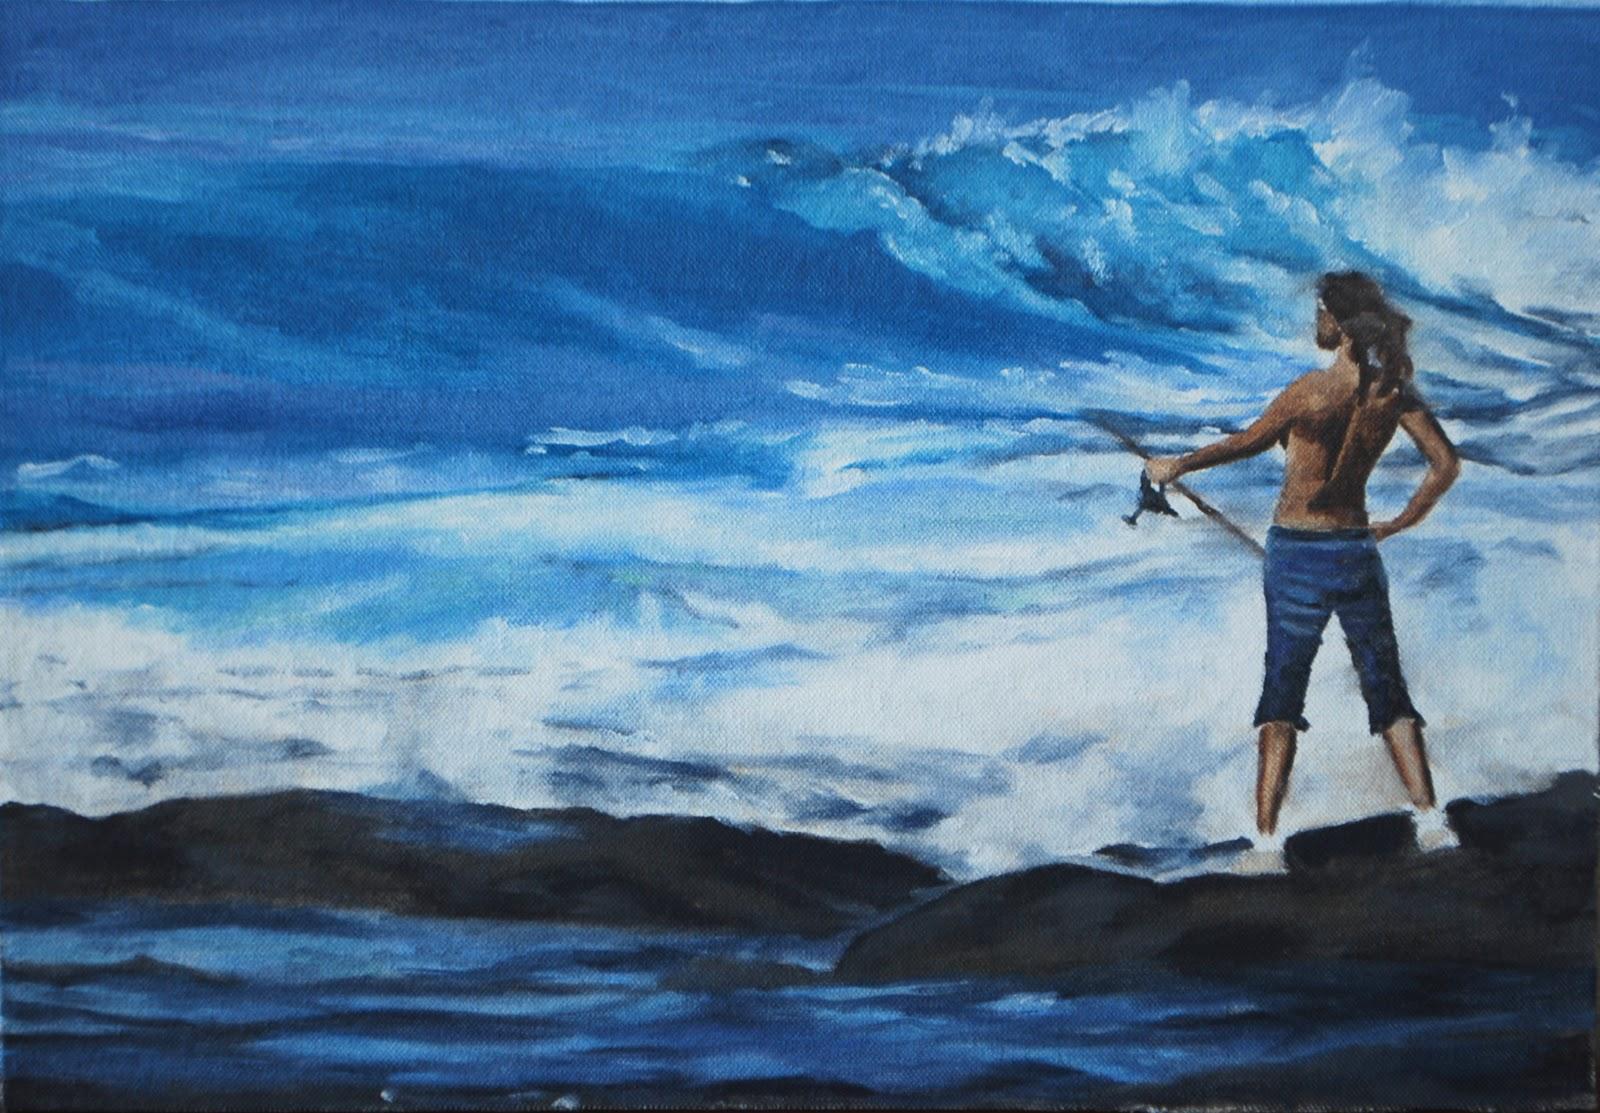 Omaž ribolovcu i ribolovu - Page 3 Surf+fishing++++++++++++++16x12